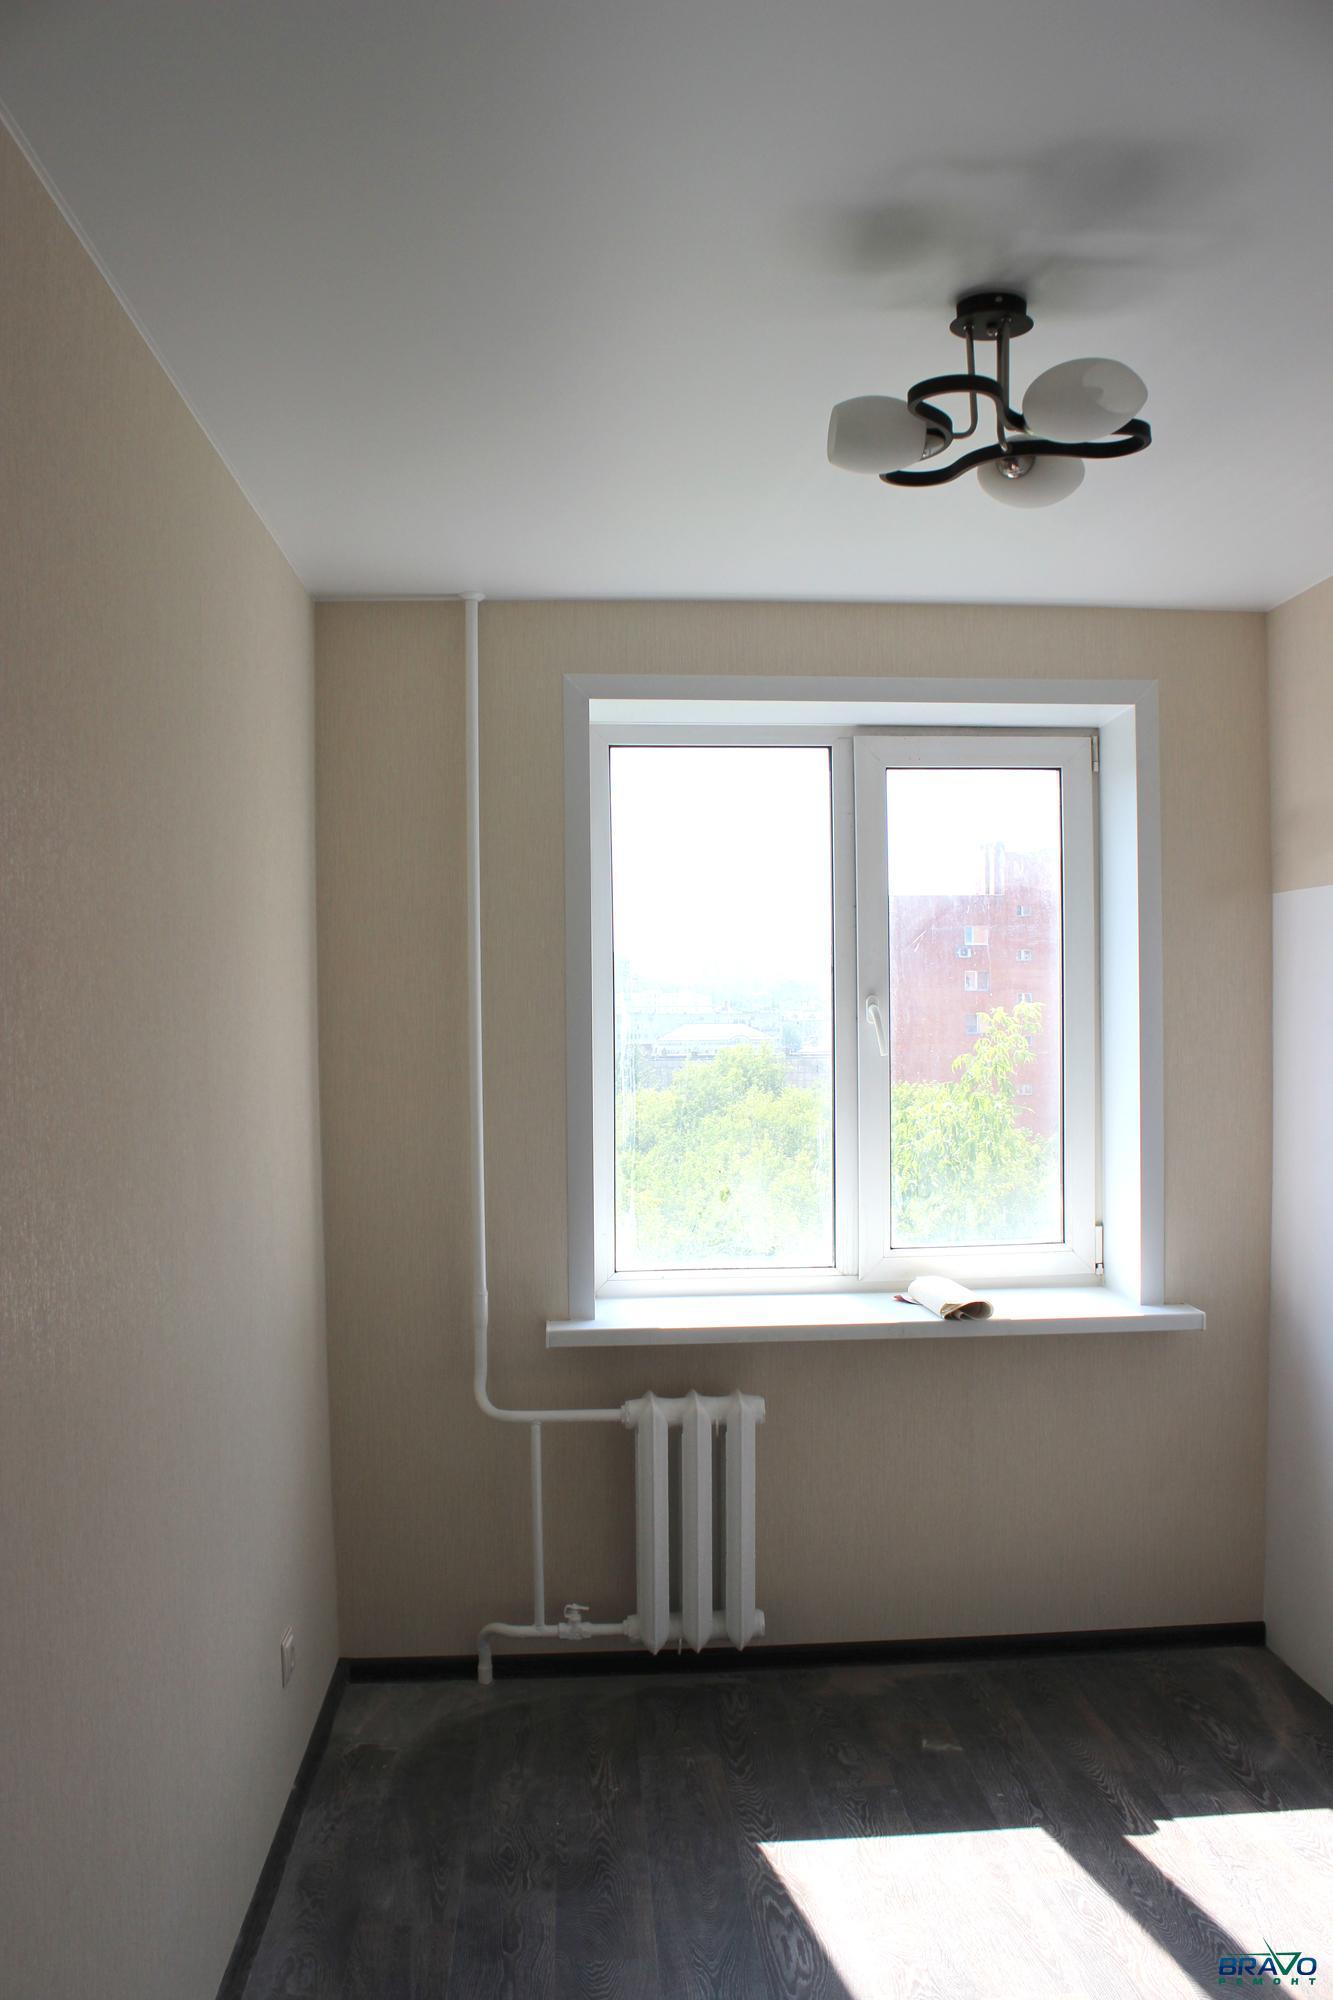 Ремонт квартиры 45 квм за 112 995 р - качественно под